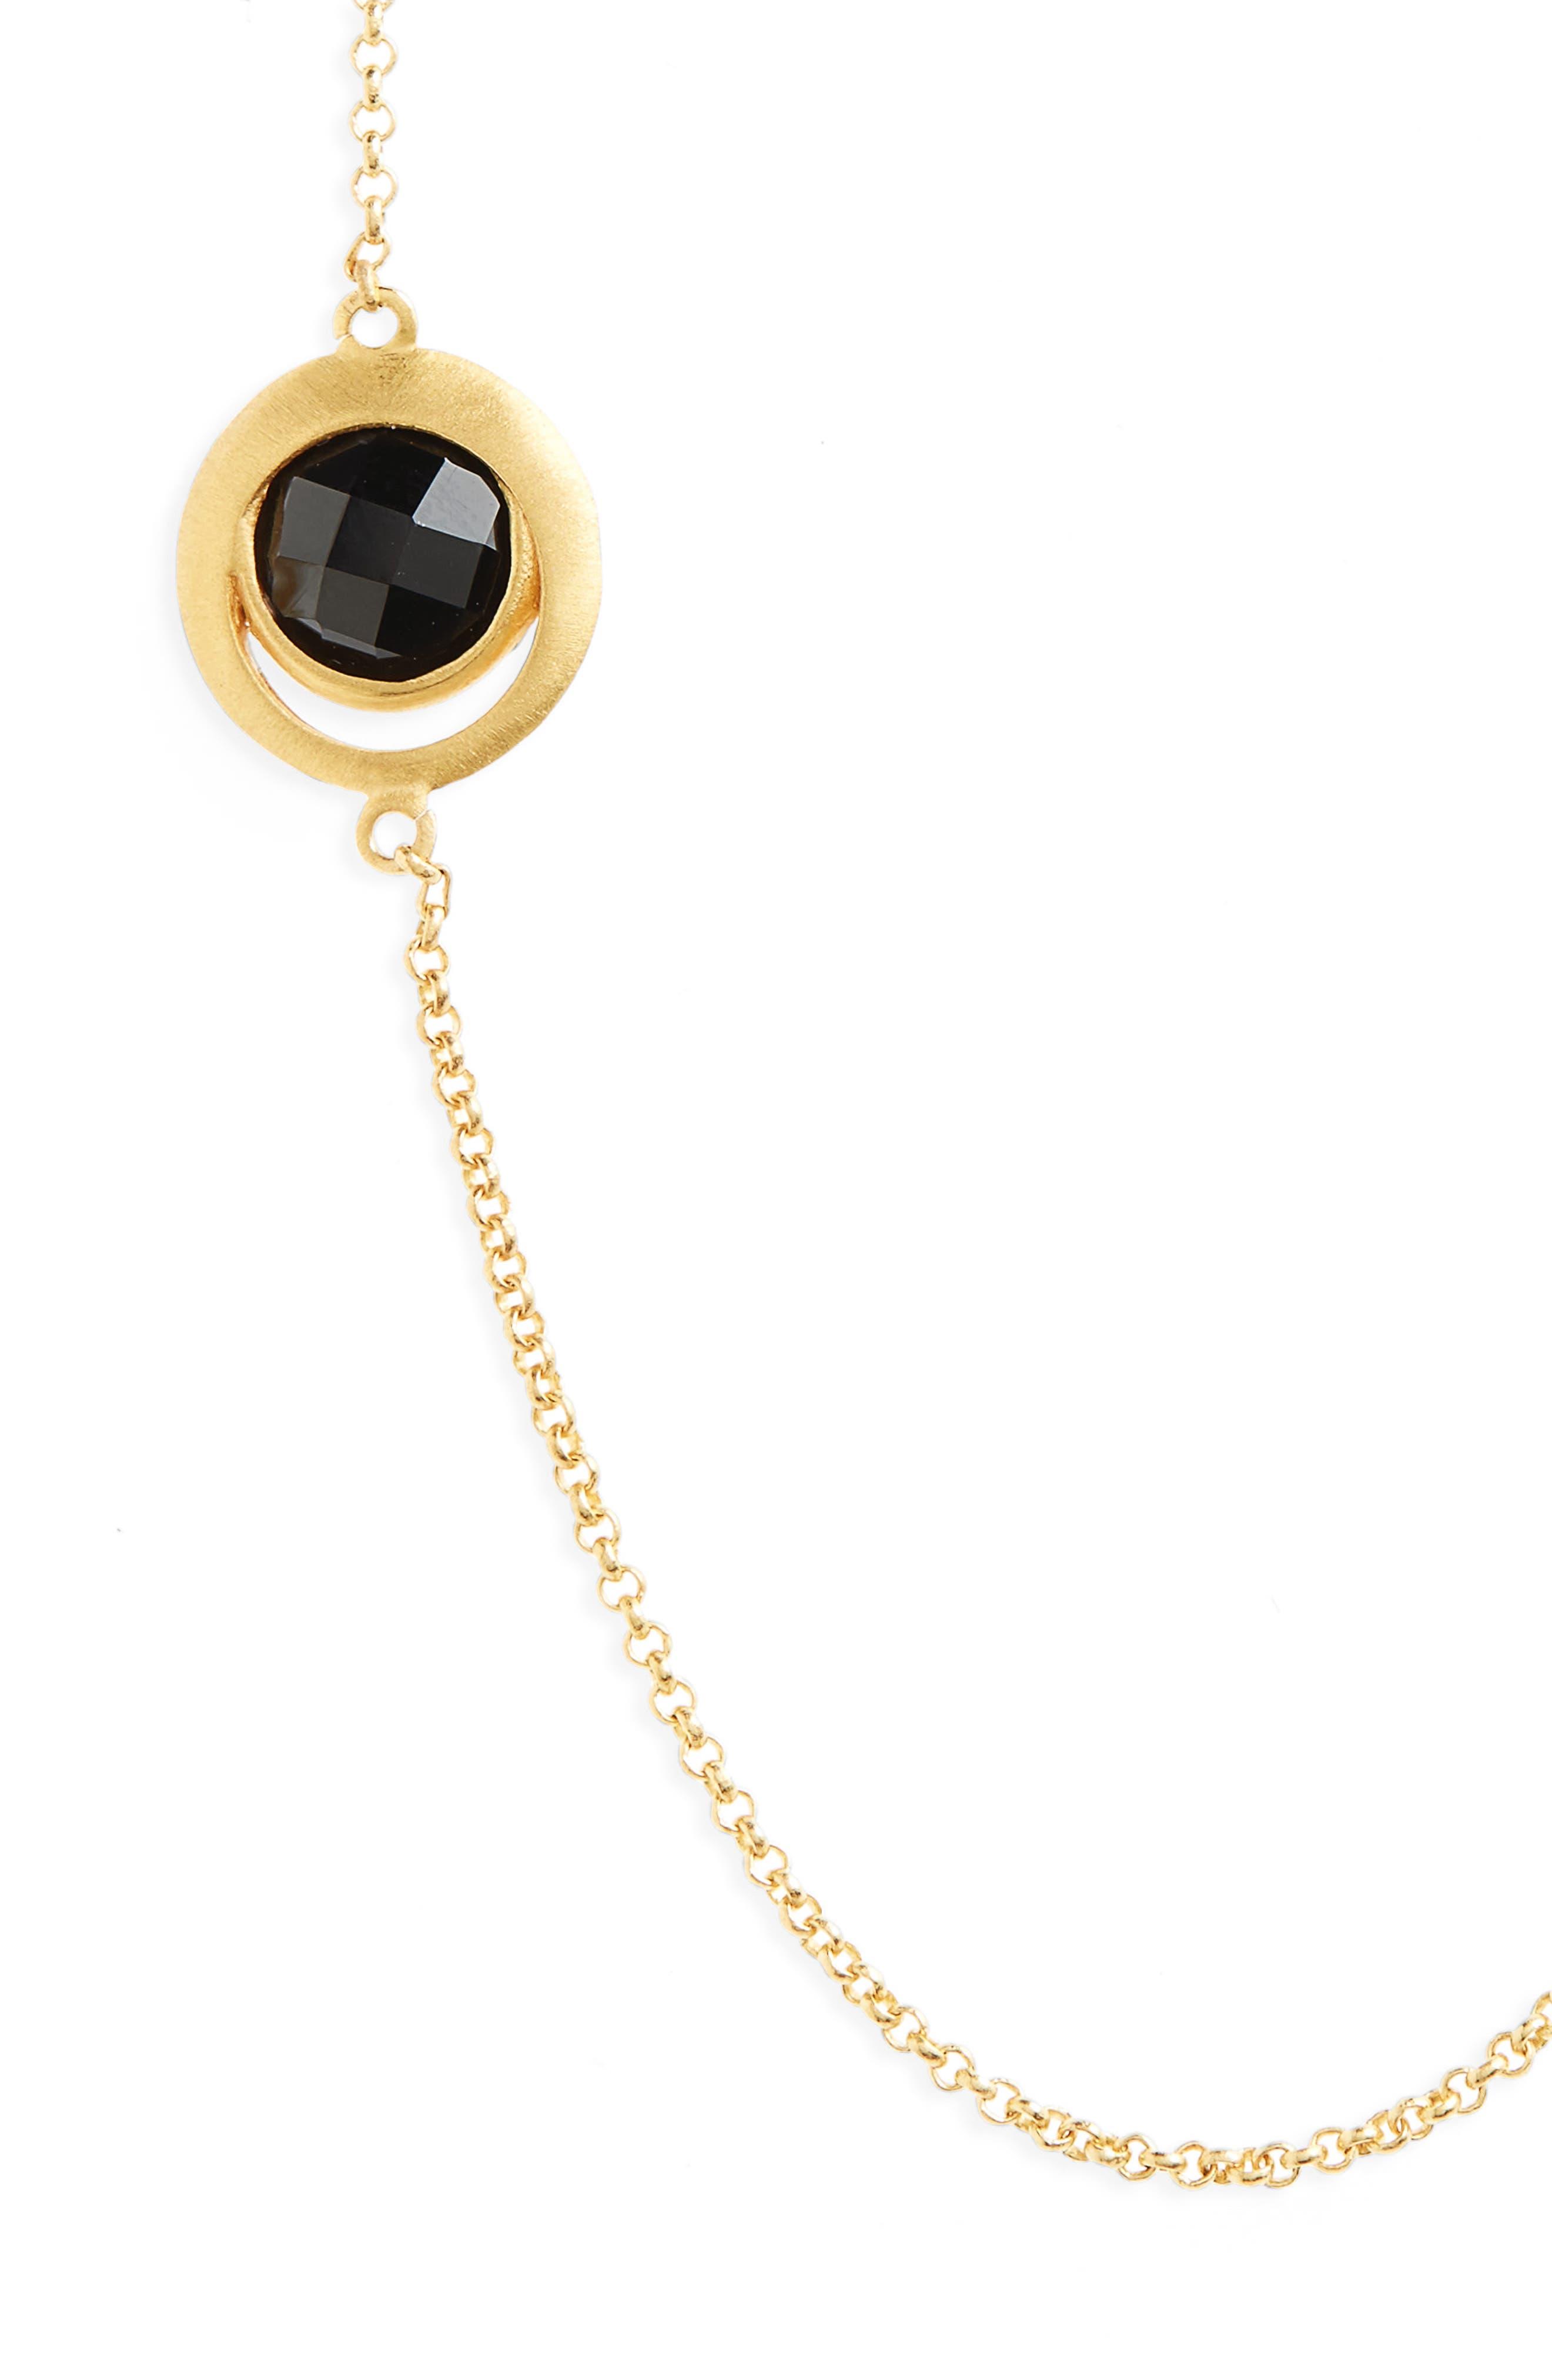 Lapa Semiprecious Stone Station Necklace,                             Alternate thumbnail 2, color,                             Black Onyx/ Gold